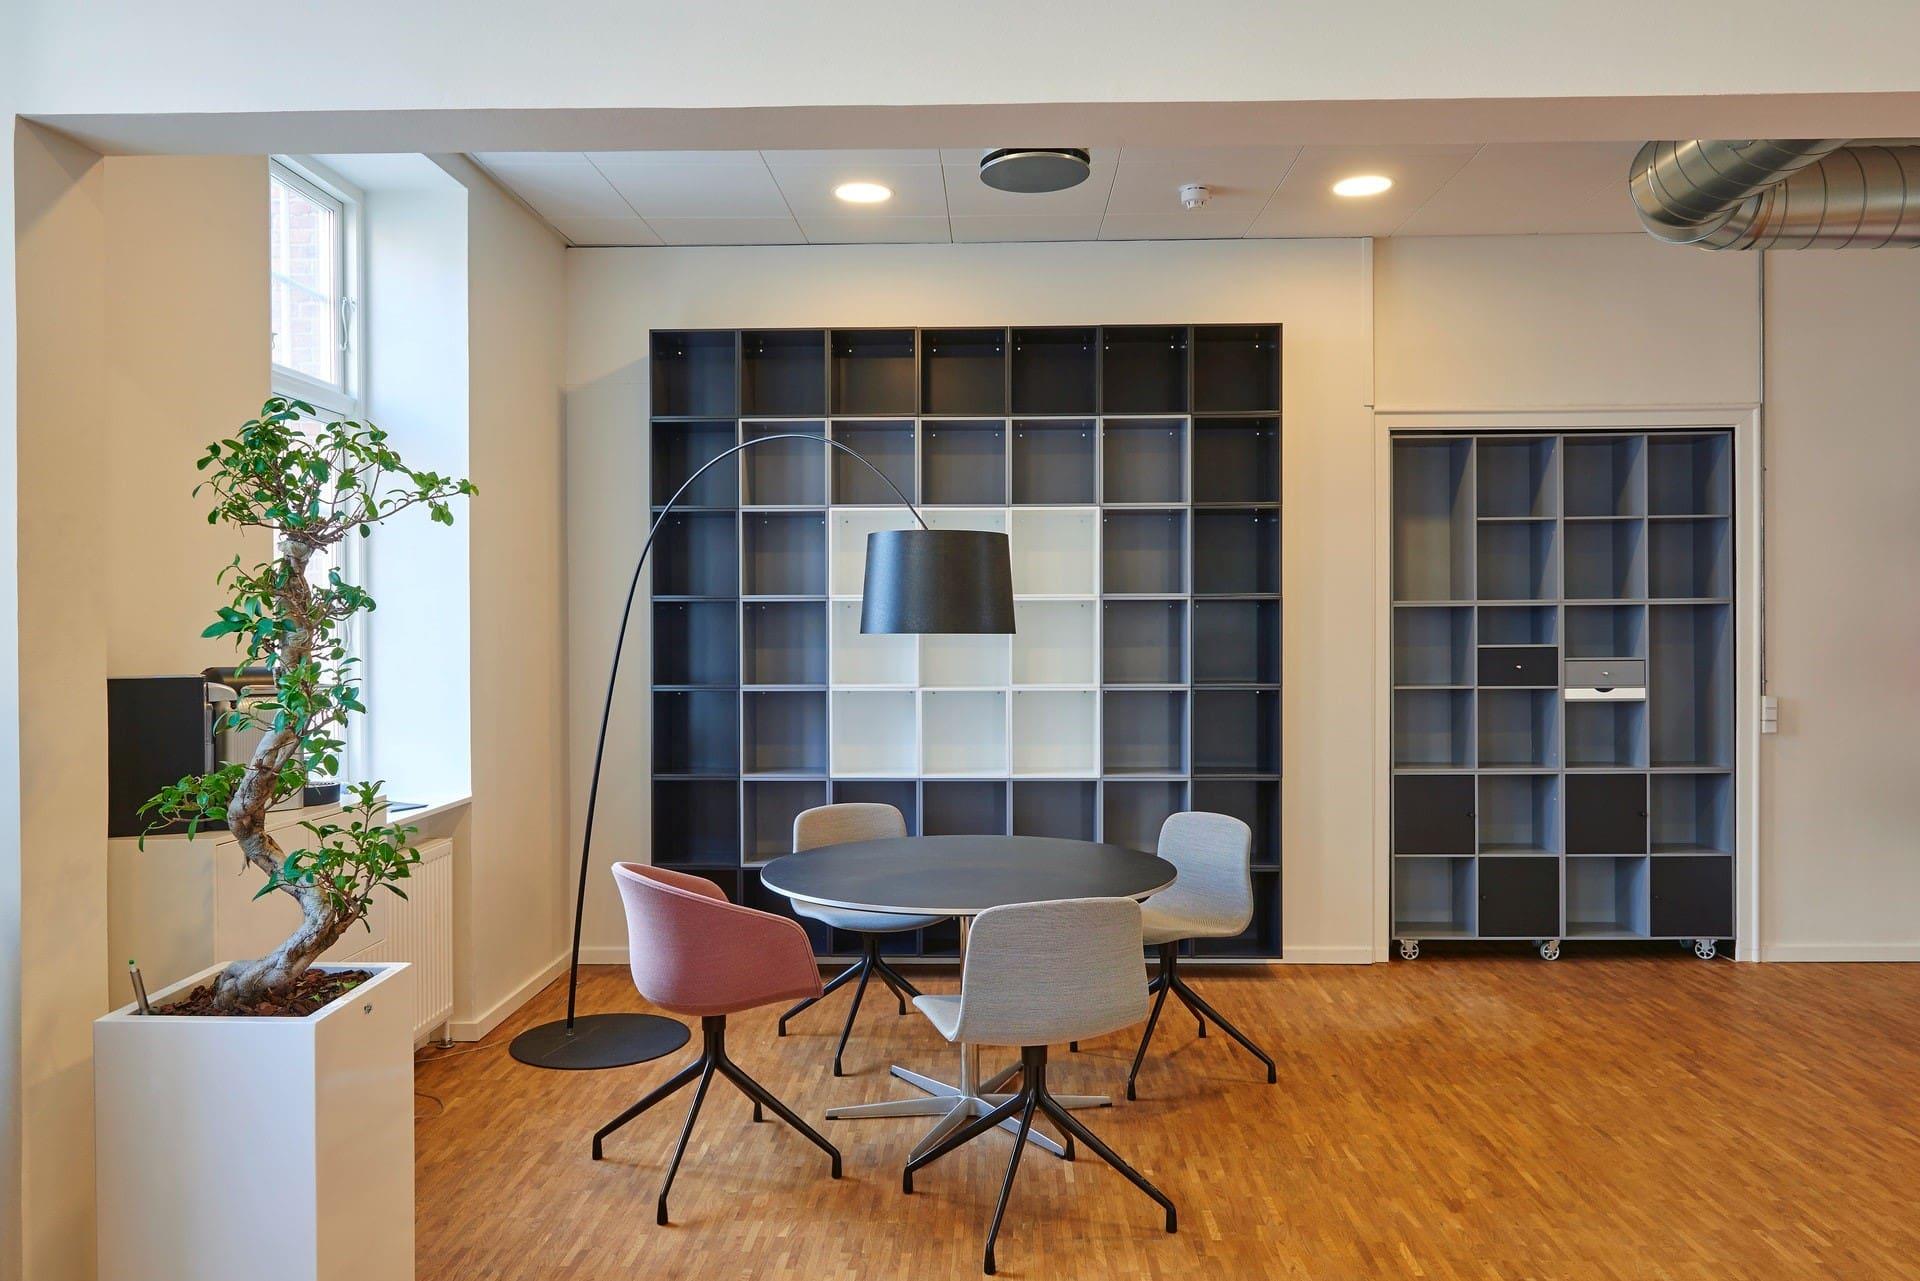 Norme di Sanificazione Uffici a Milano - Covid-19 | SAGEM Pulizie Milano